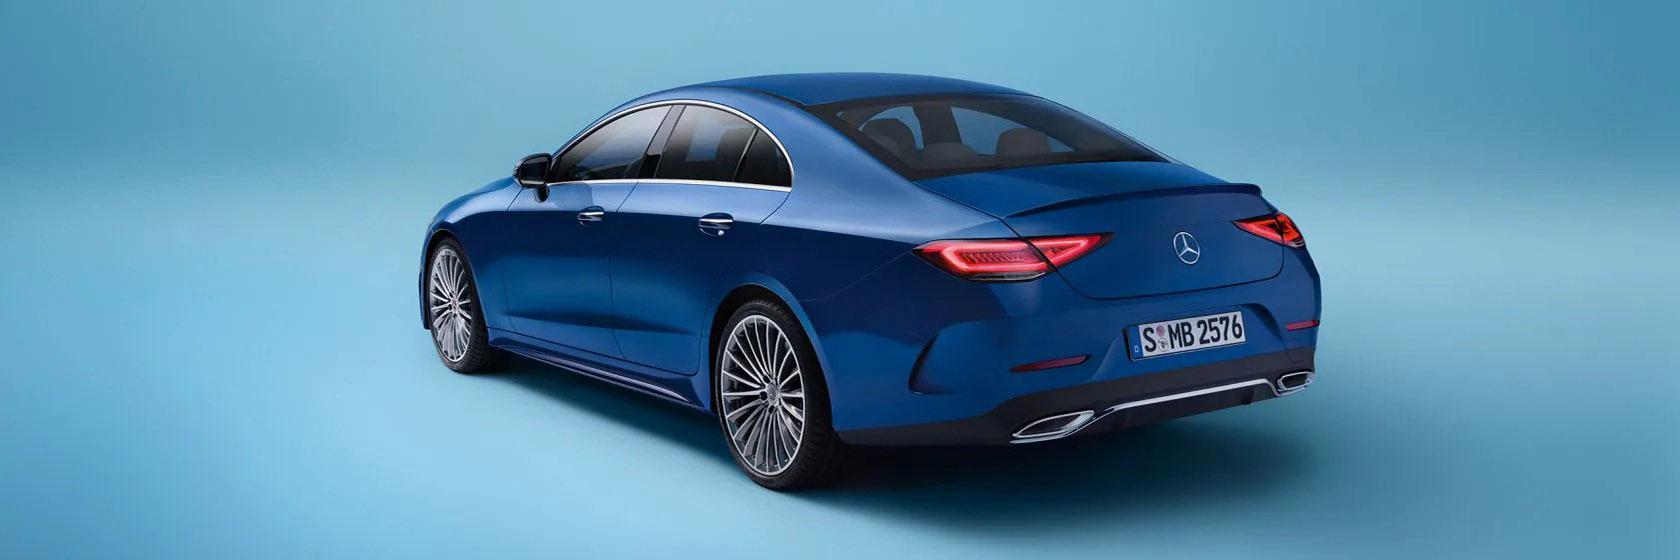 Mercedes–Benz CLS Coupe Дизайн